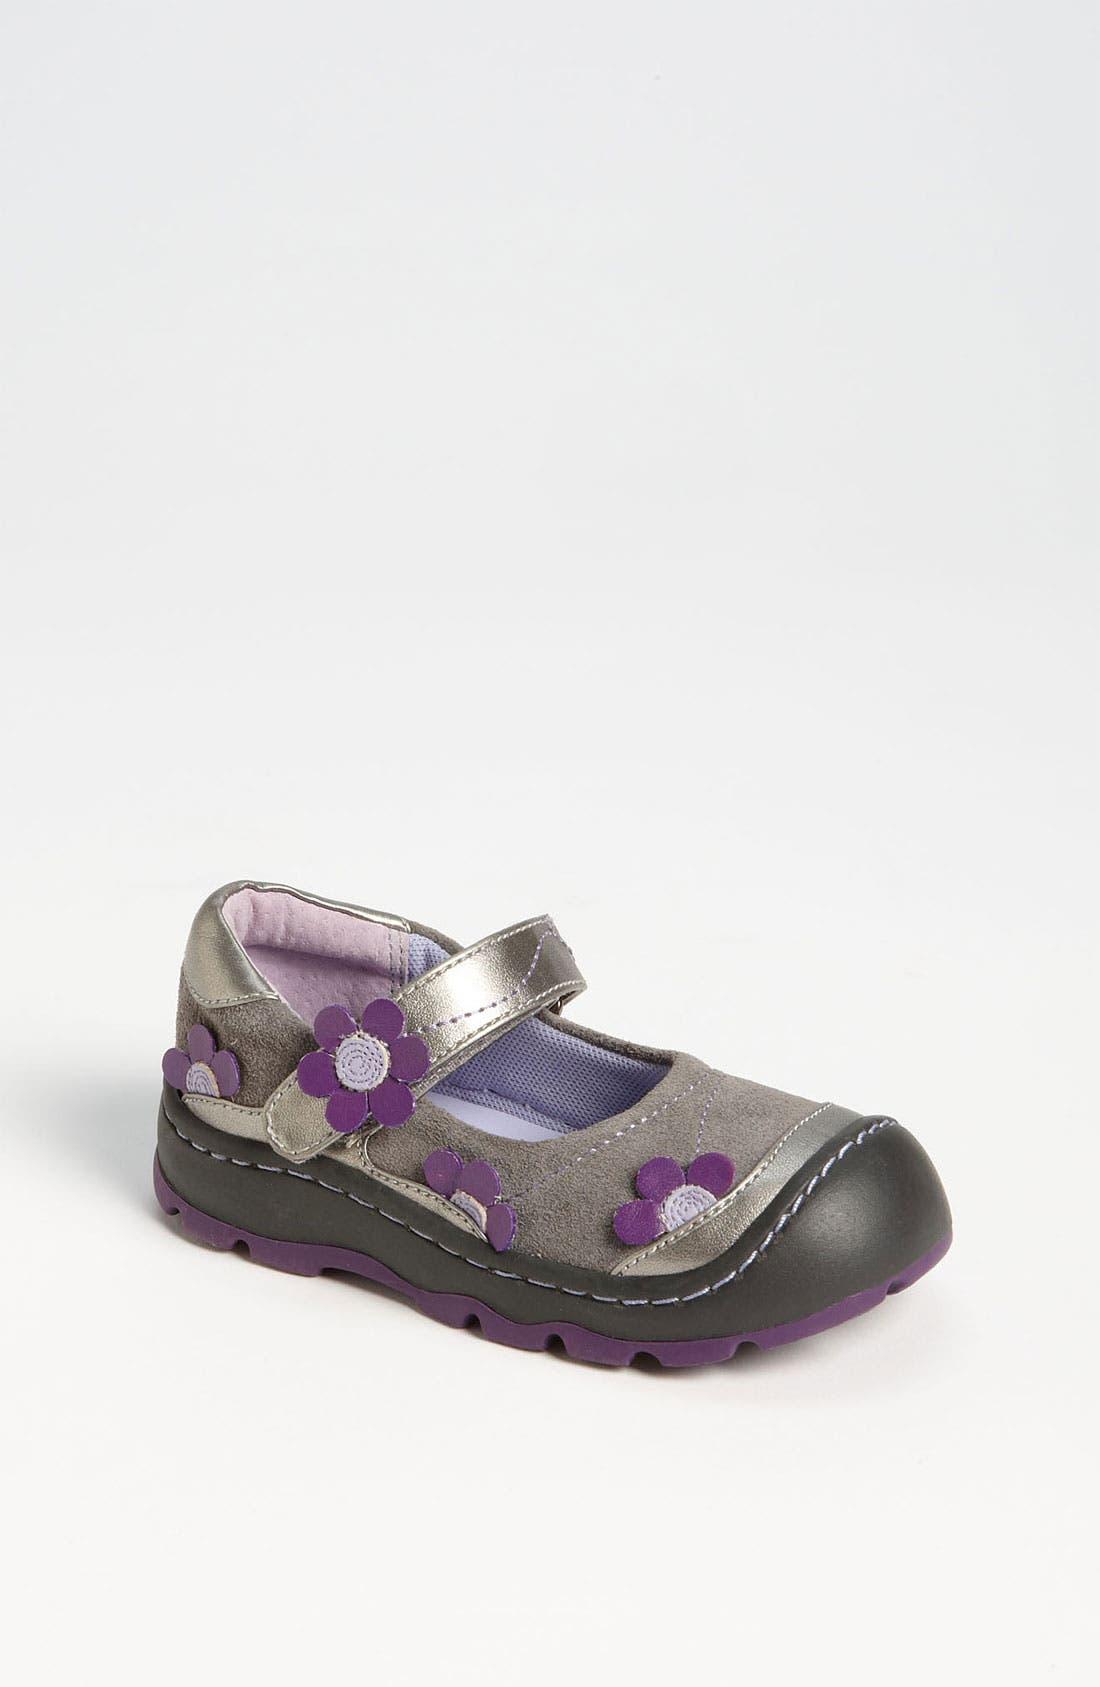 Main Image - Jumping Jacks 'Flower Breeze' Slip-On (Walker & Toddler)